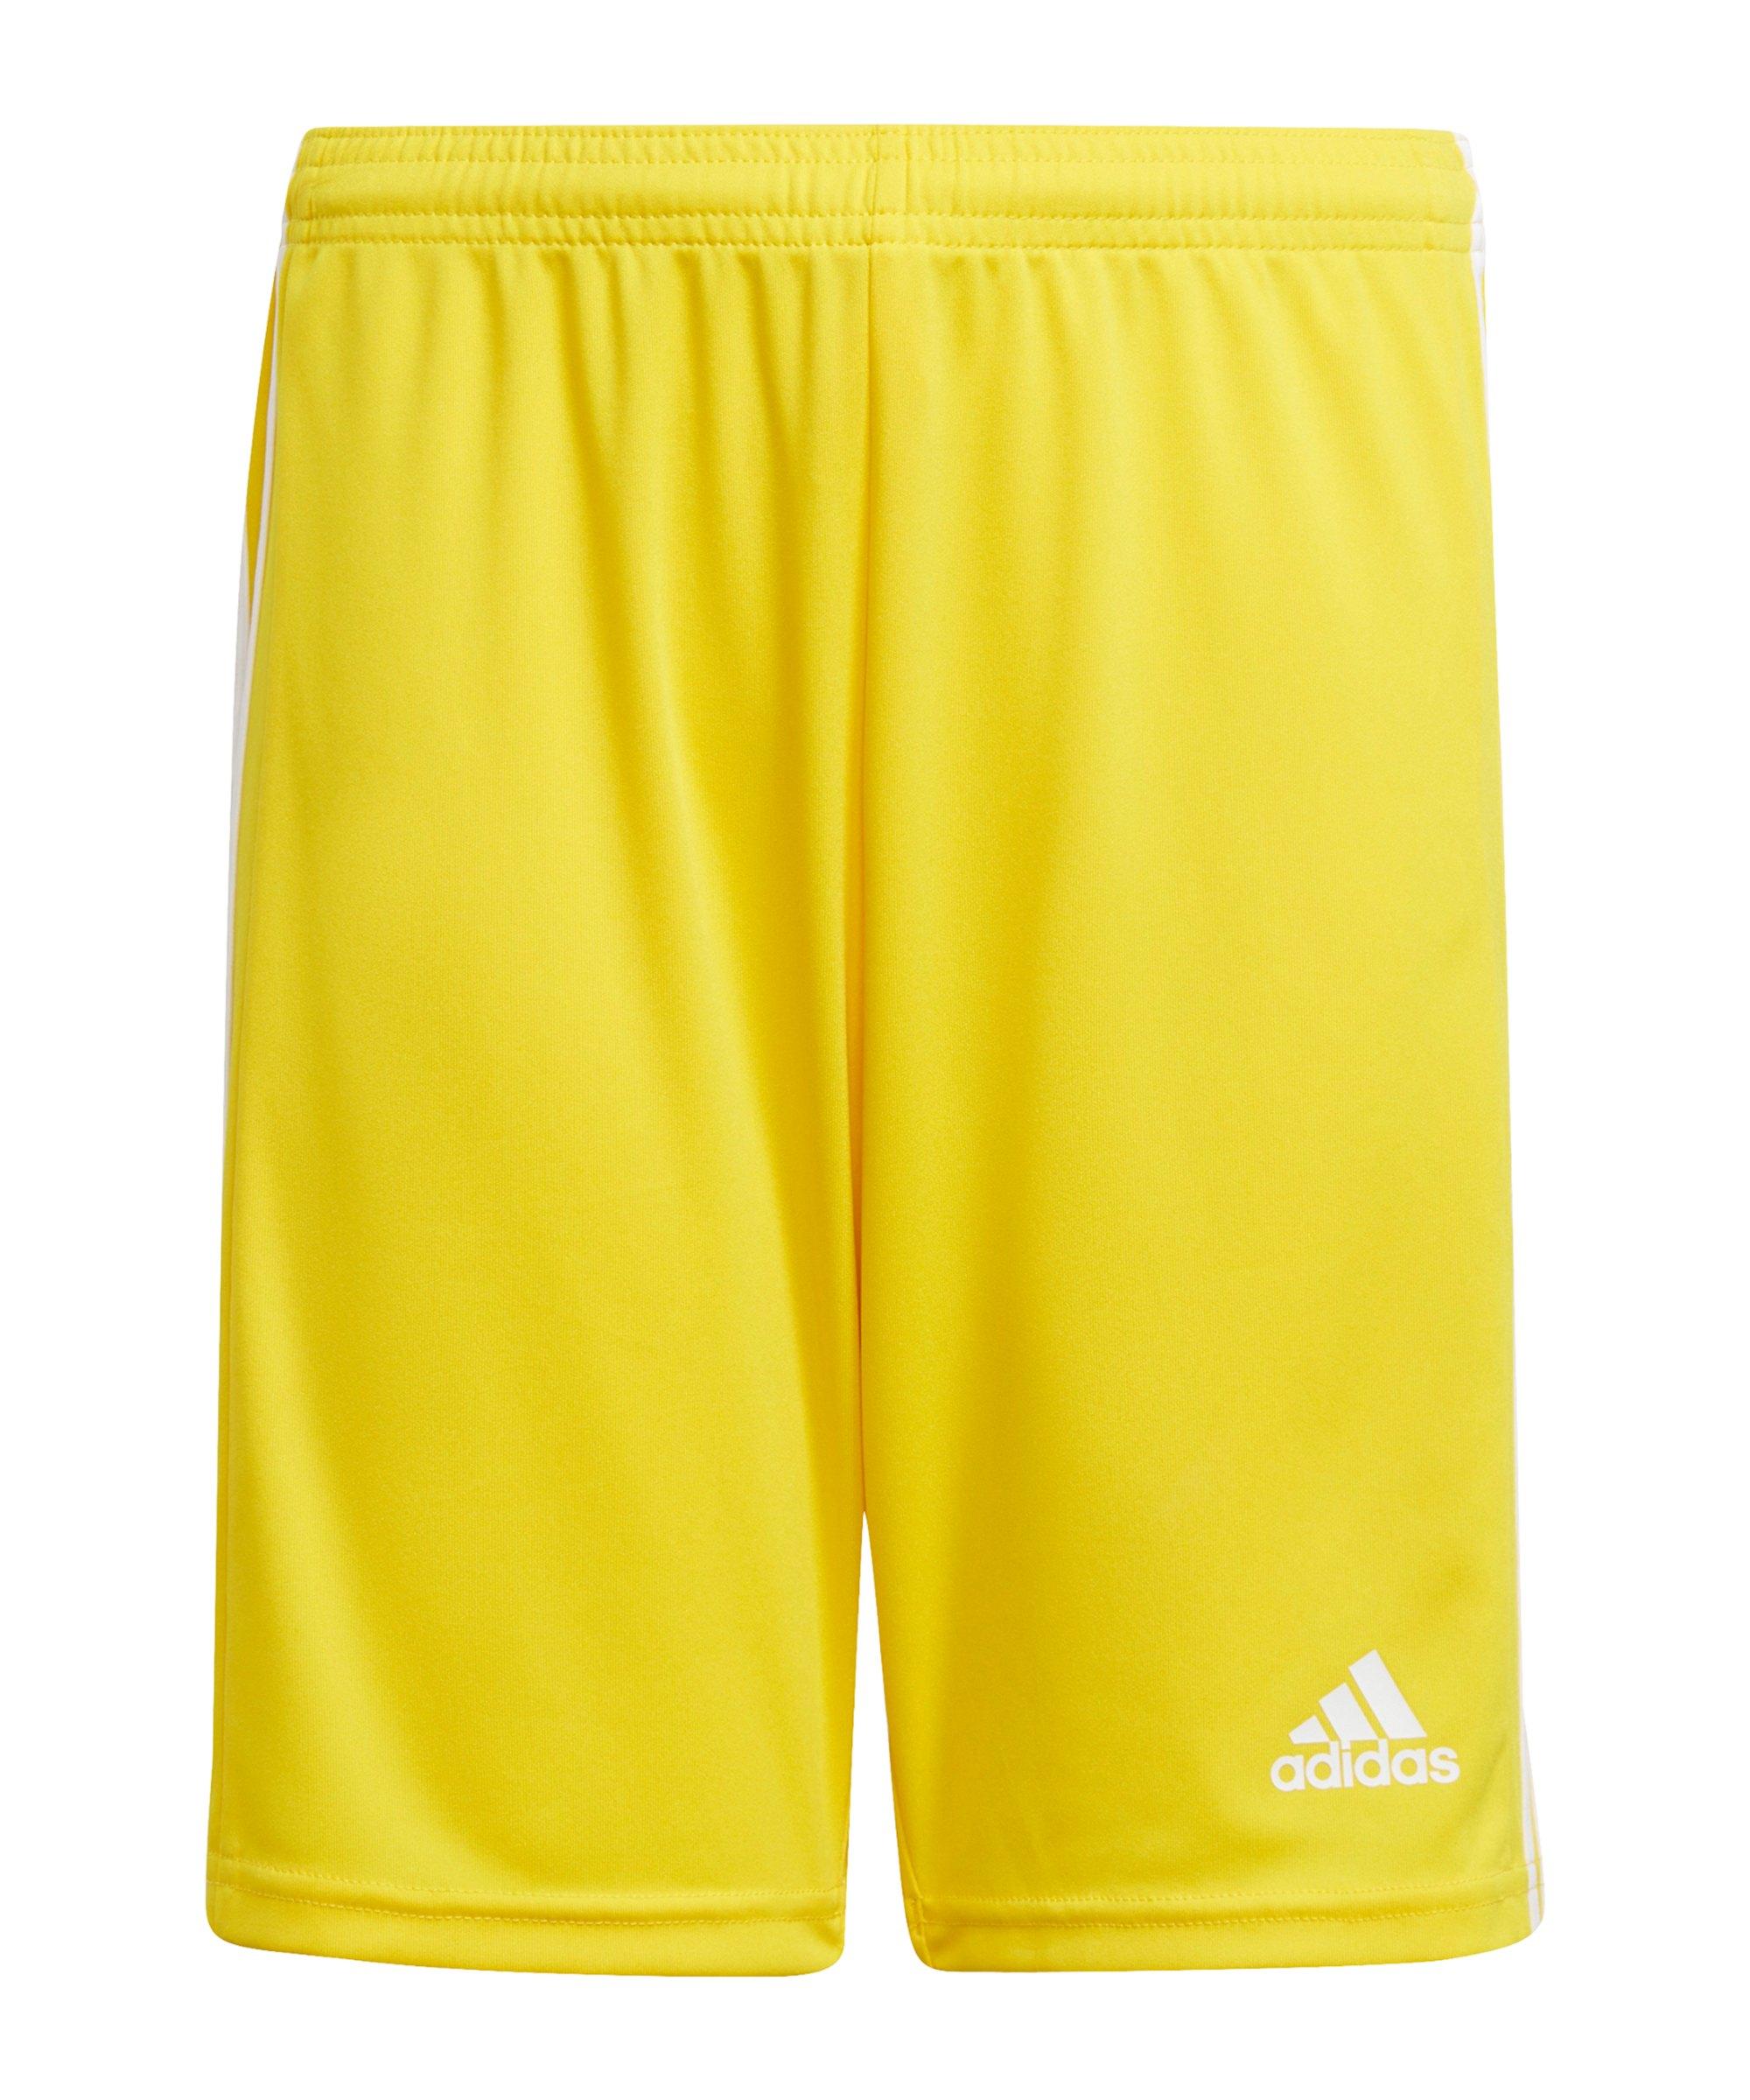 adidas Squadra 21 Short Kids Gelb Weiss - gelb